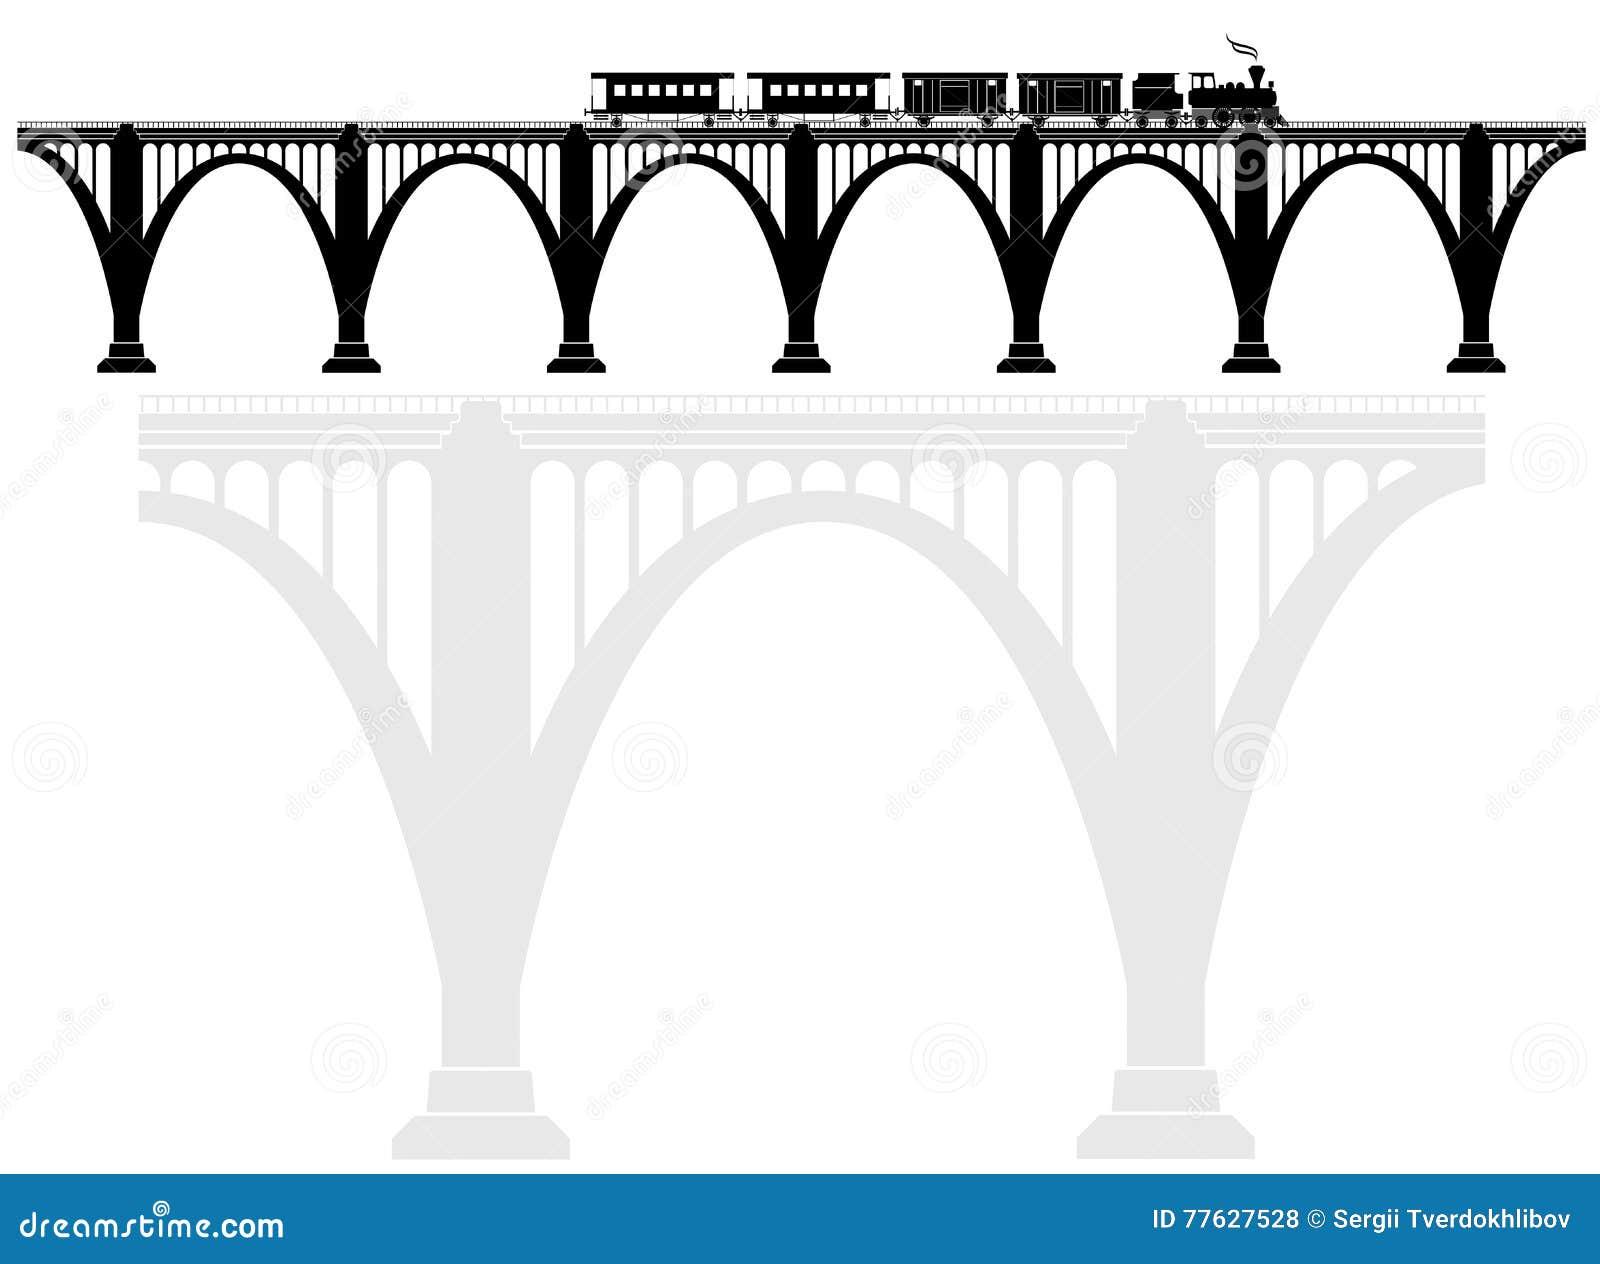 Openwork Arch Concrete Bridge With A Steam Locomotive